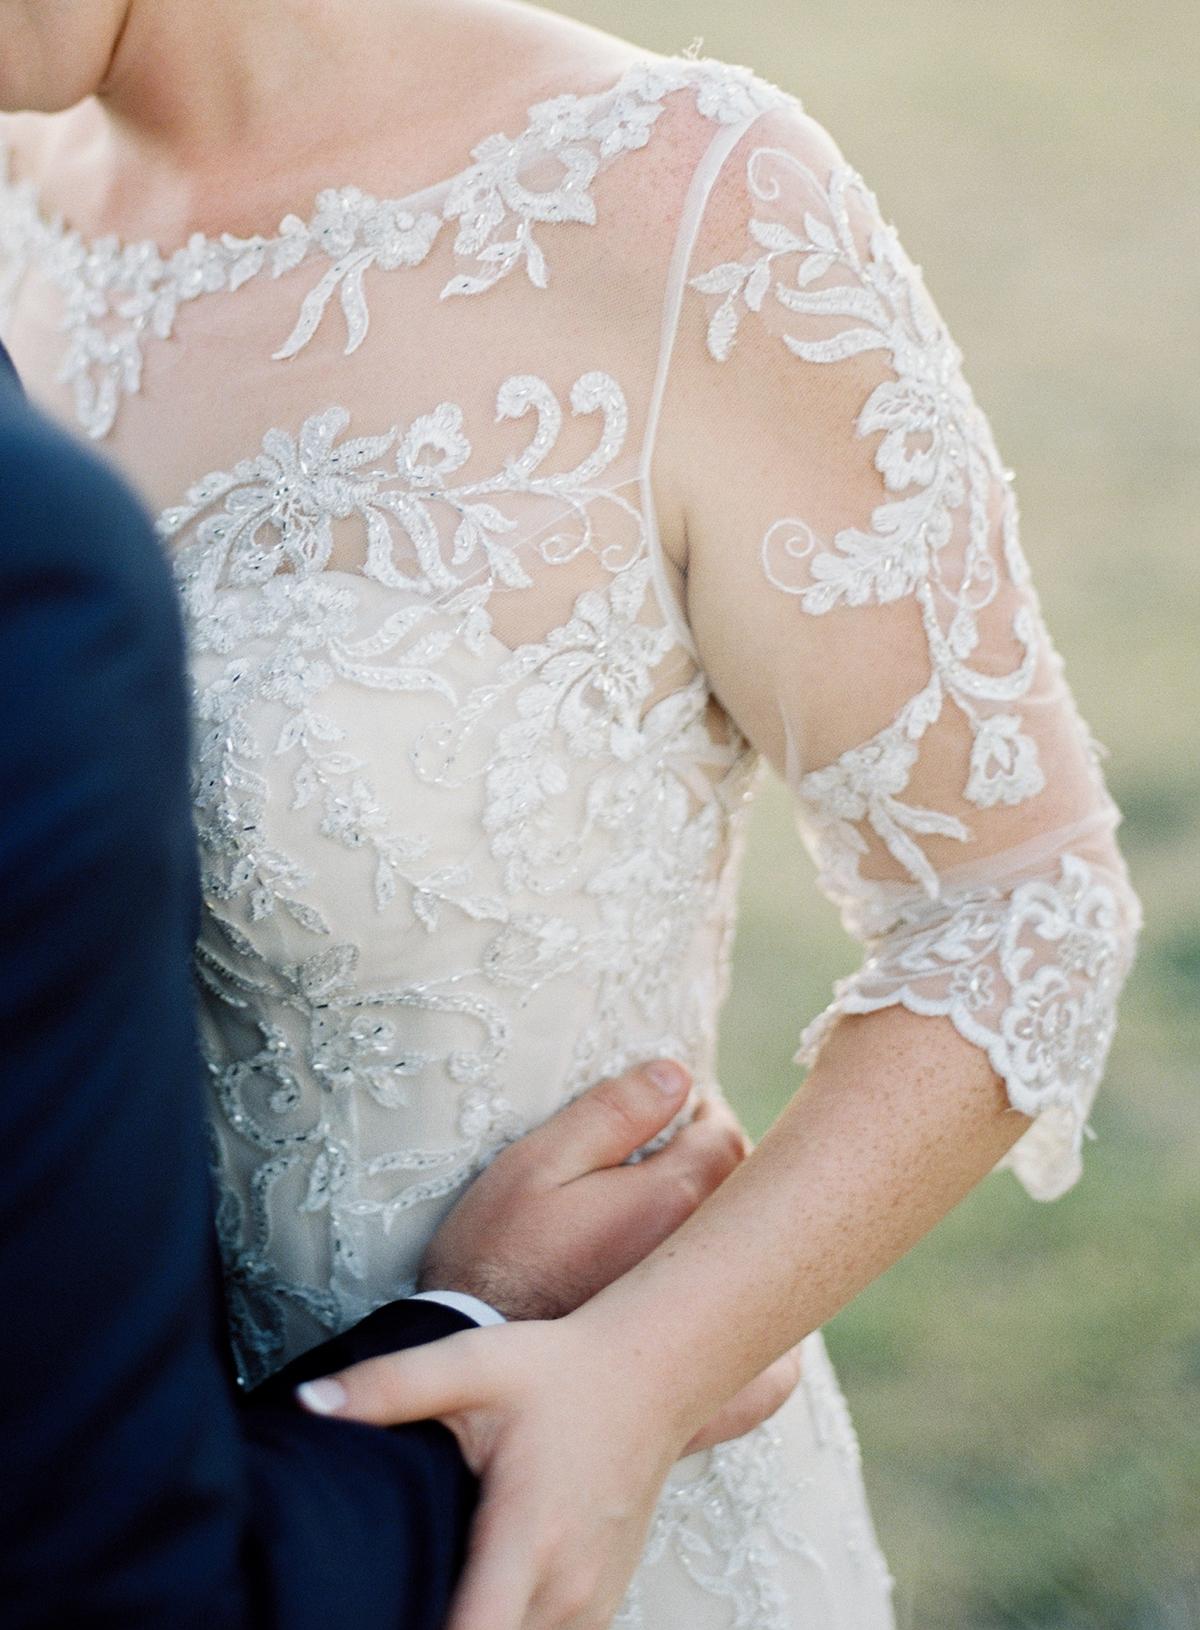 The Vine Grove Mudgee Wedding, Photography by Mr Edwards_1795.jpg